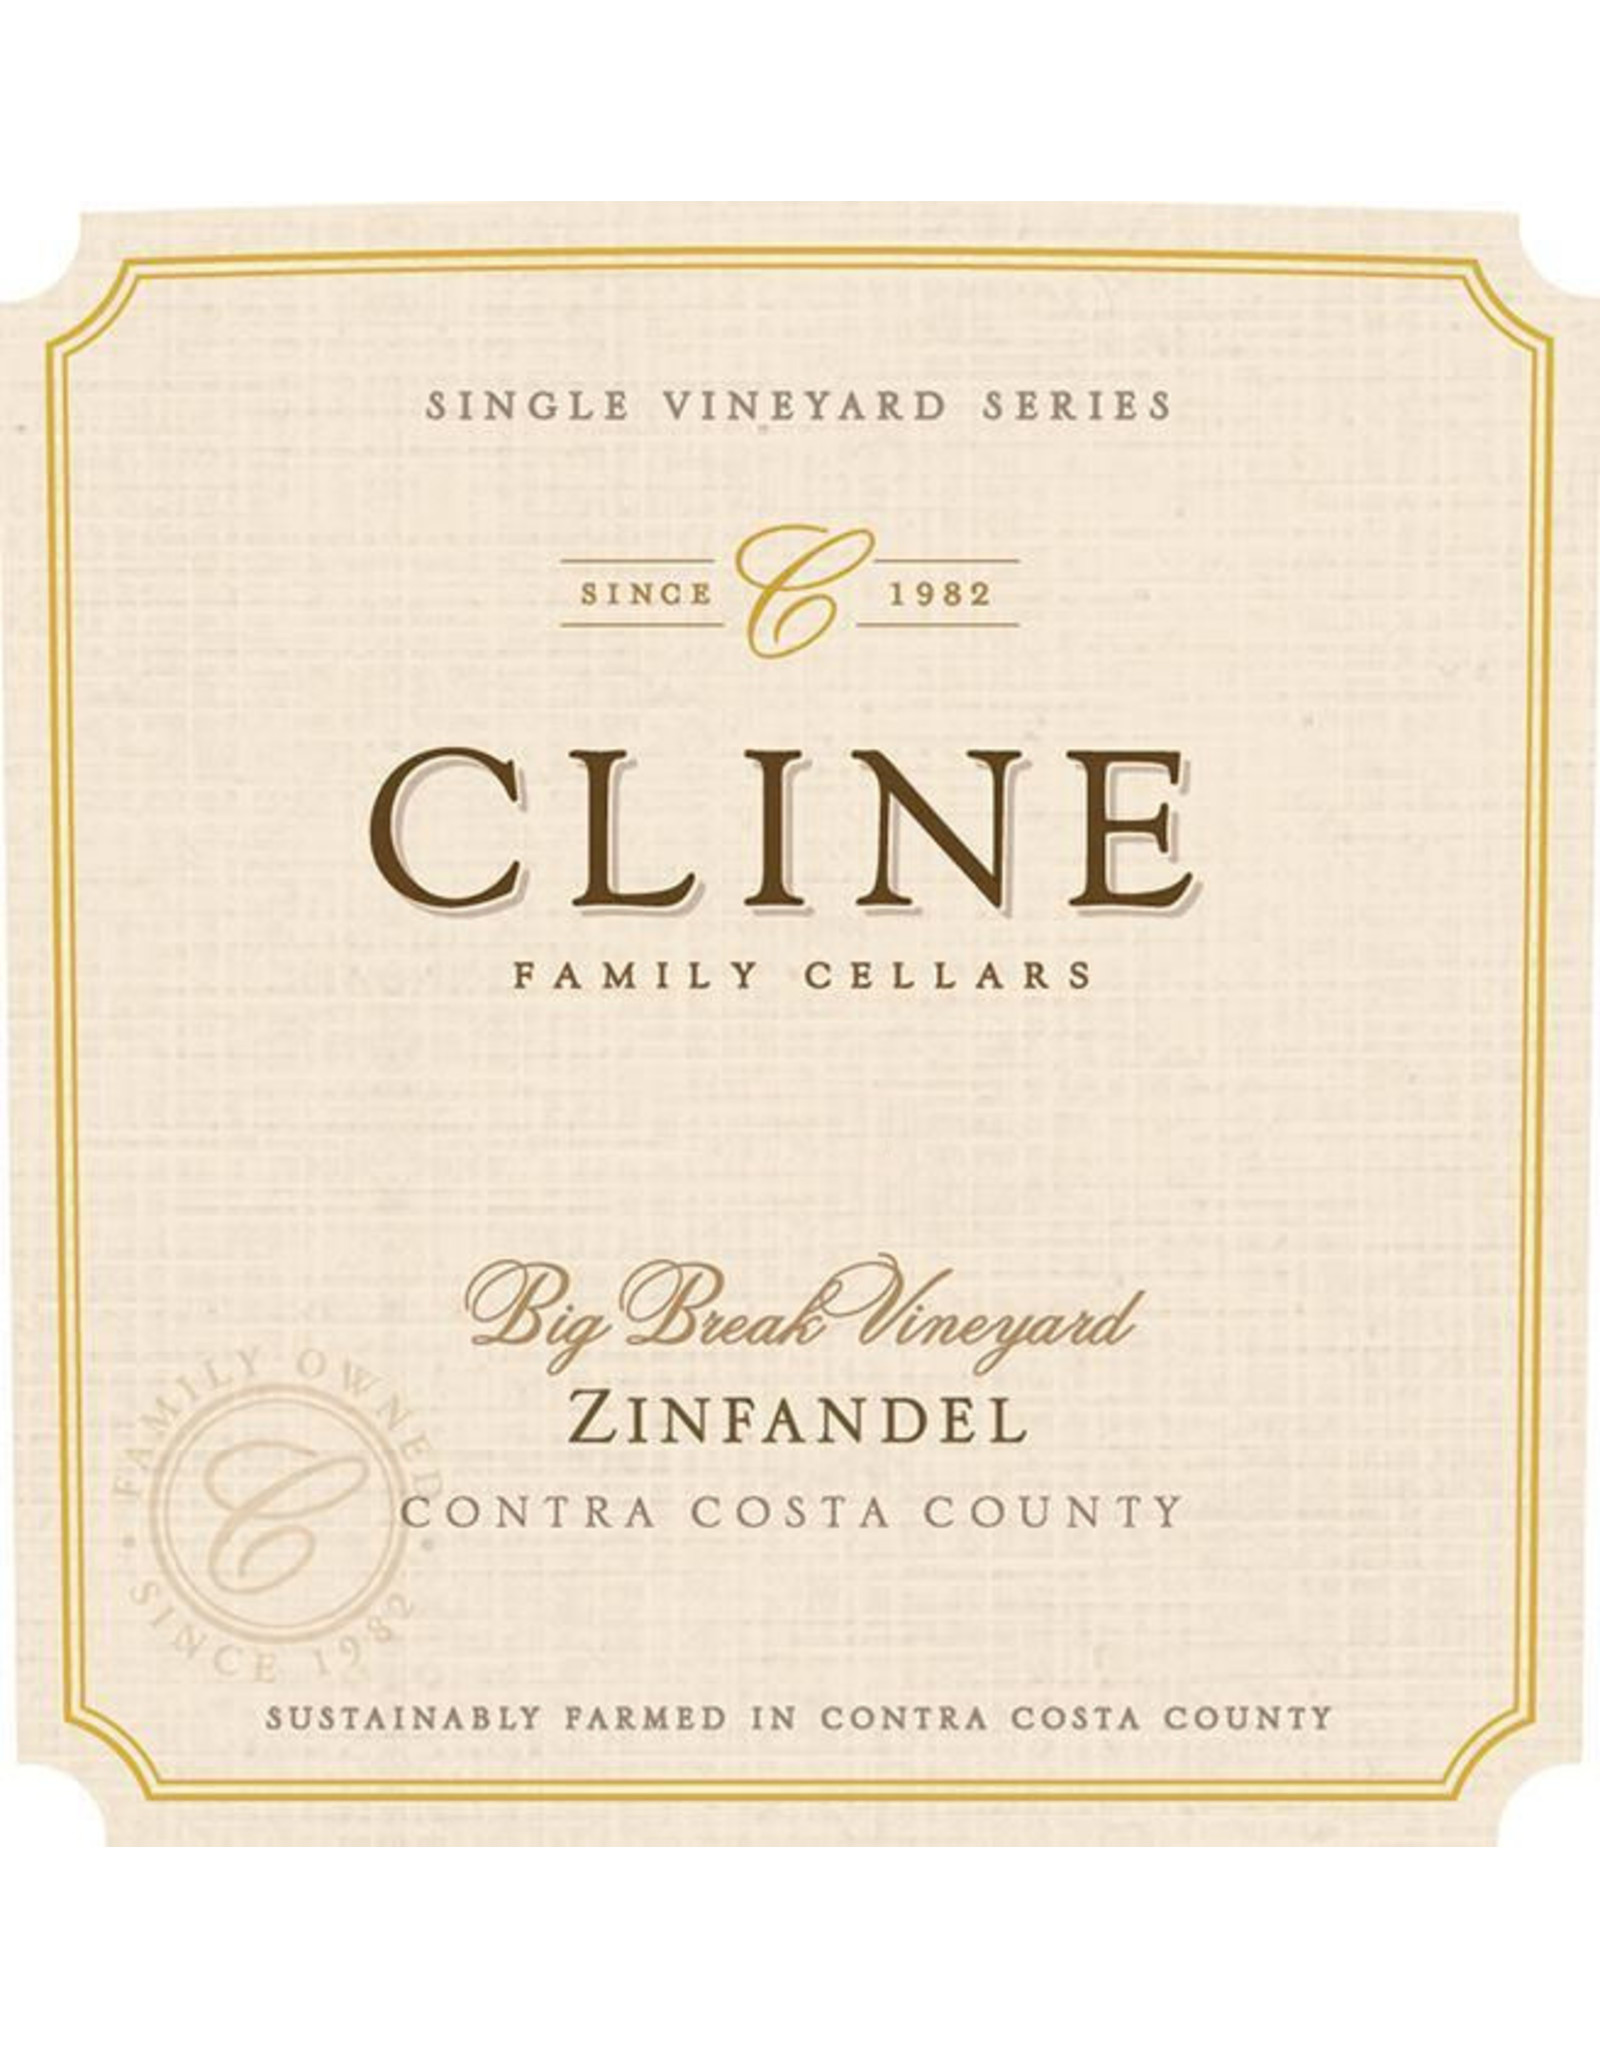 Cline Cellars Cline Zinfandel 'Big Break Vineyard' (2017)